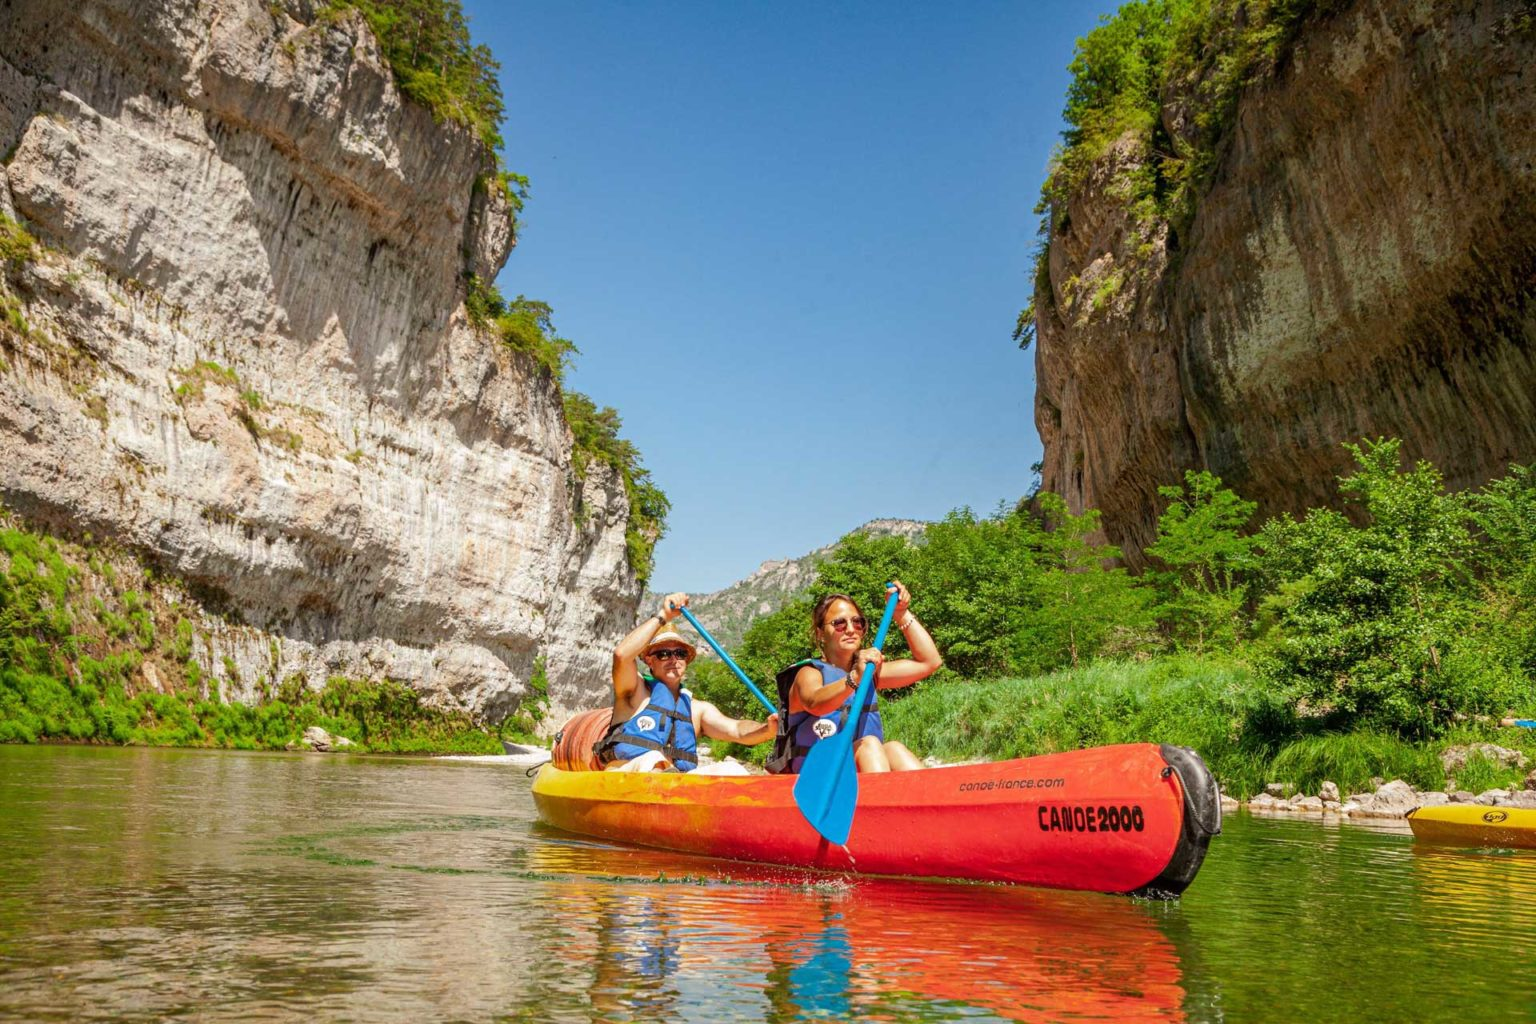 Canoe 2000 descentes en canoe Tarn